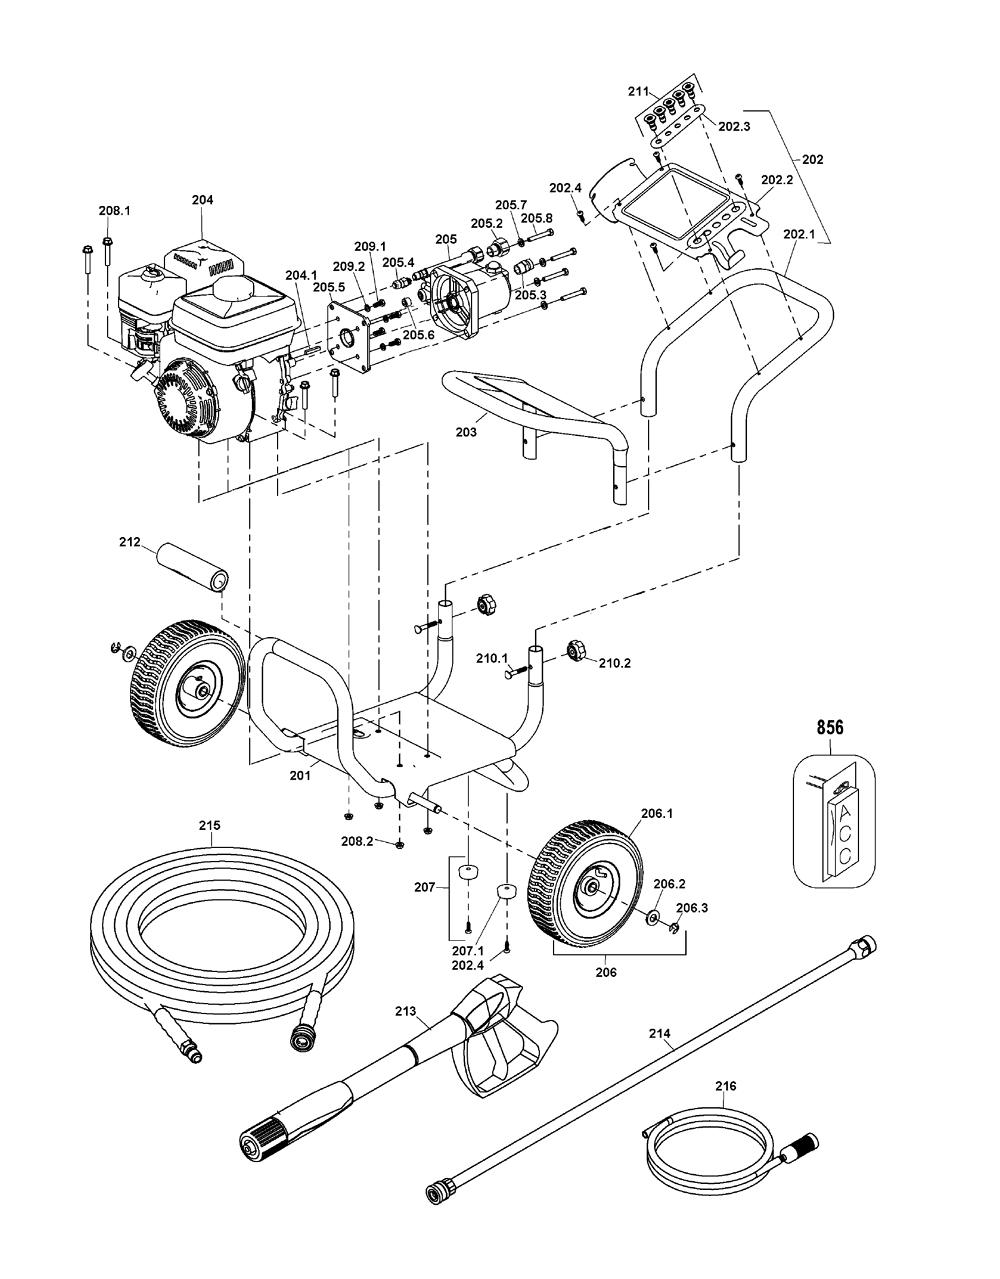 Additionally honda generators eu3000is carburetor diagram also honda e1500 generator parts diagram furthermore honda generator schematics